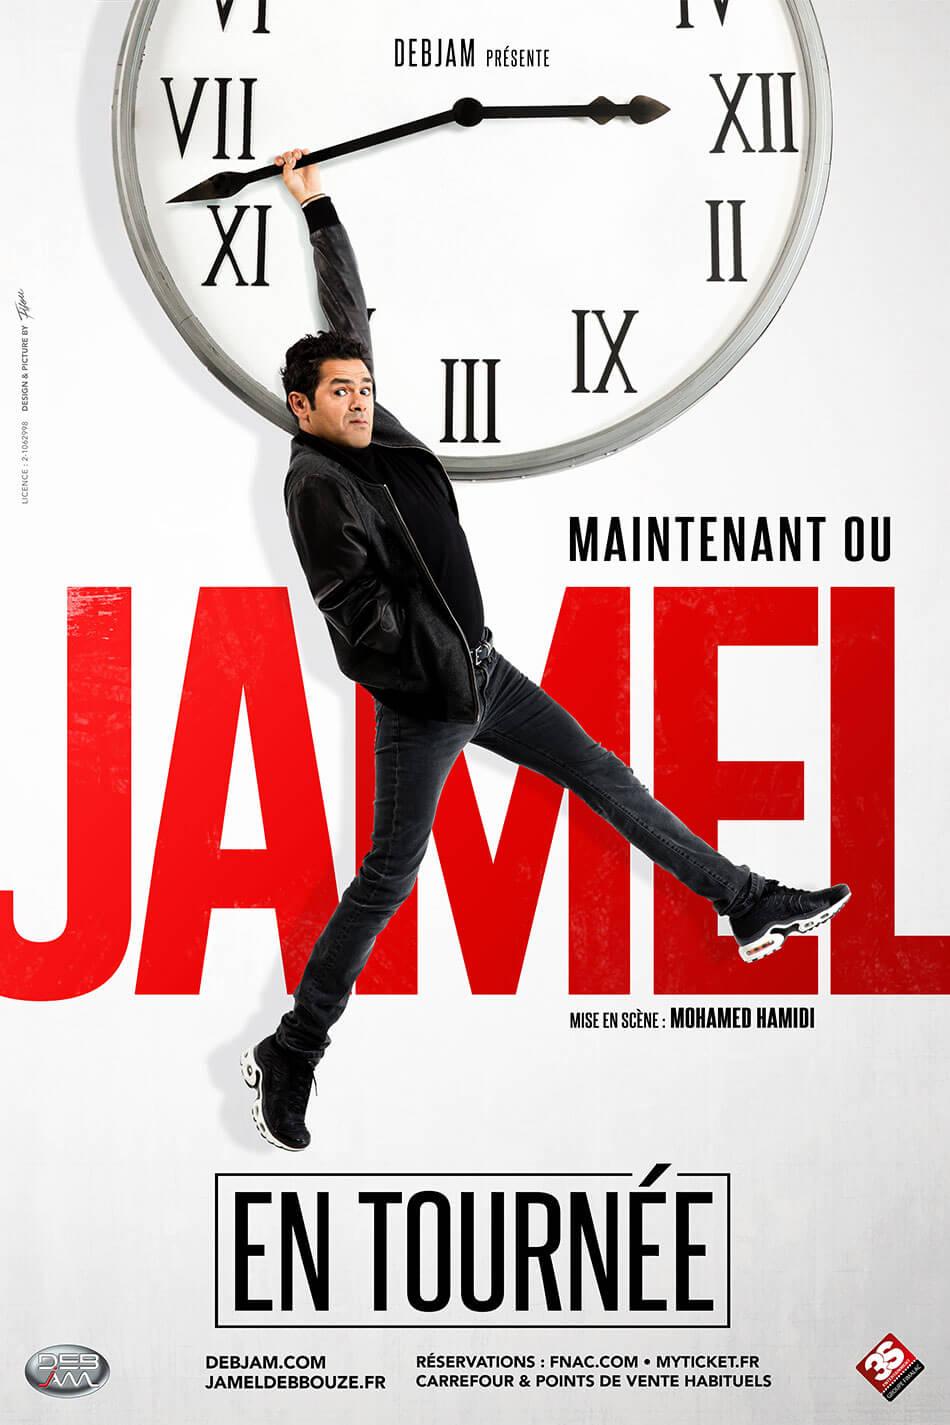 Jamel Debbouze spectacle maintenant ou Jamel